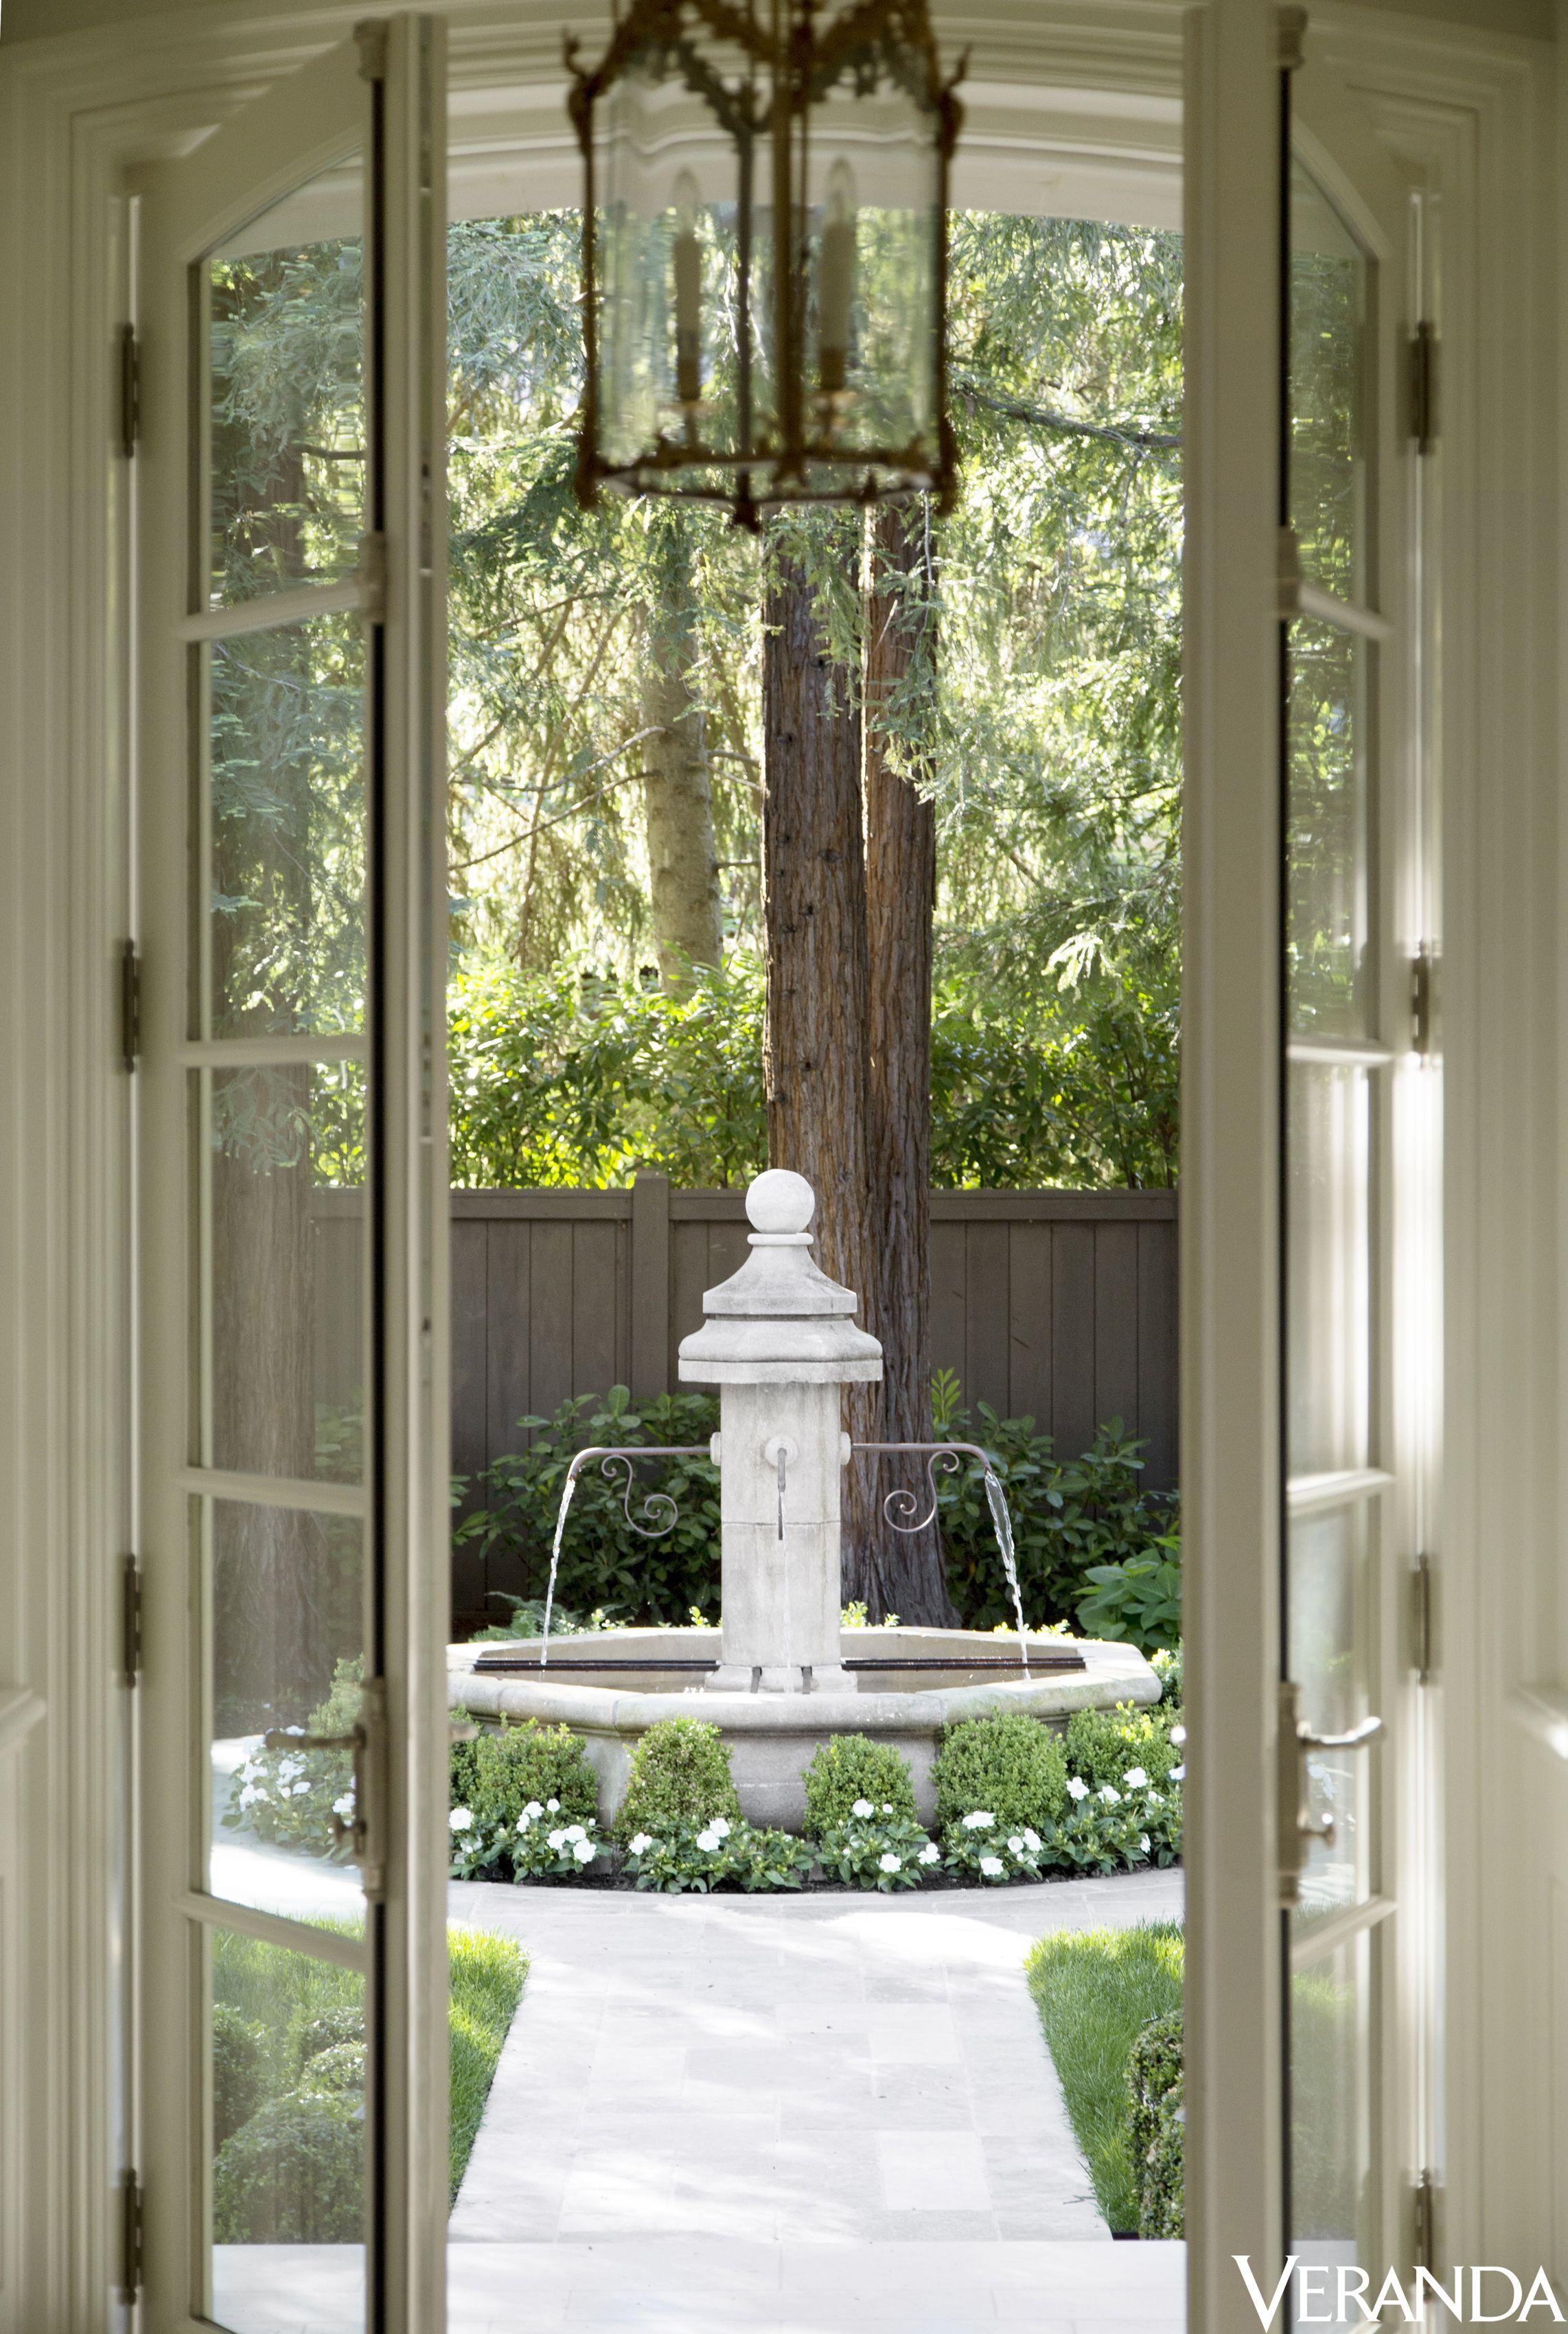 sumptuous design ideas home garden magazine.  HOUSE TOUR A California Mansion With Sumptuous French Sensibilities